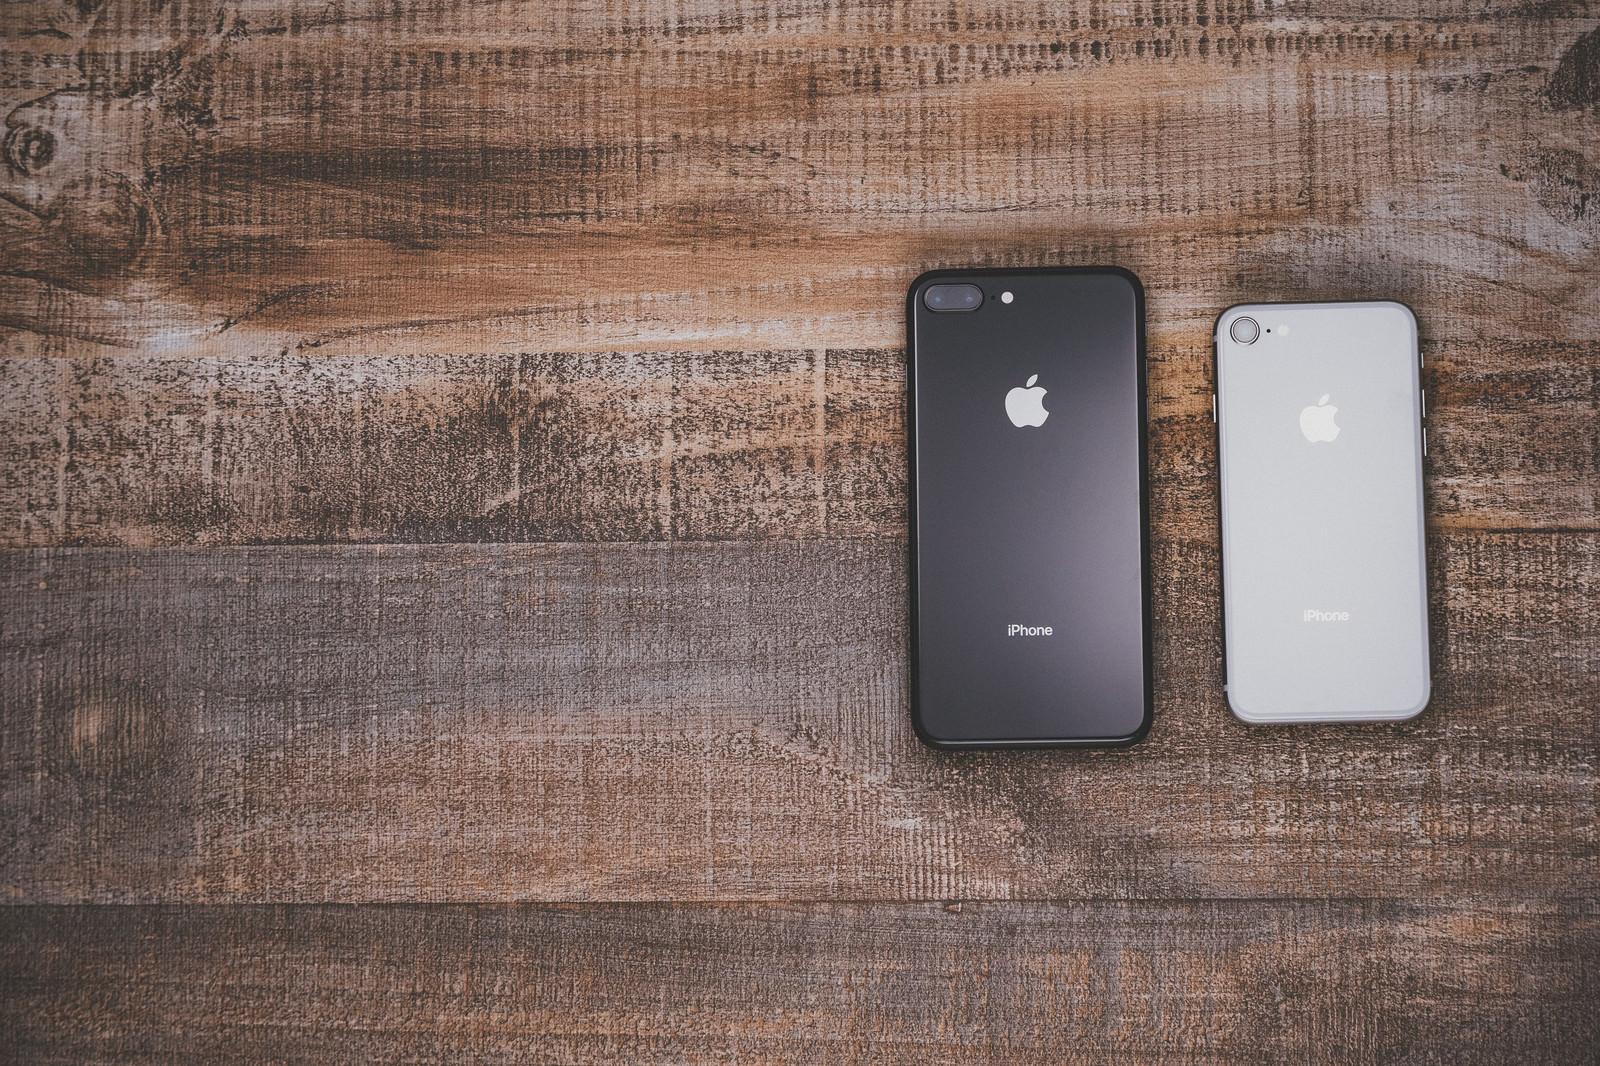 「iPhone 8 Plus スペースグレイと iPhone 8 シルバー | 写真の無料素材・フリー素材 - ぱくたそ」の写真